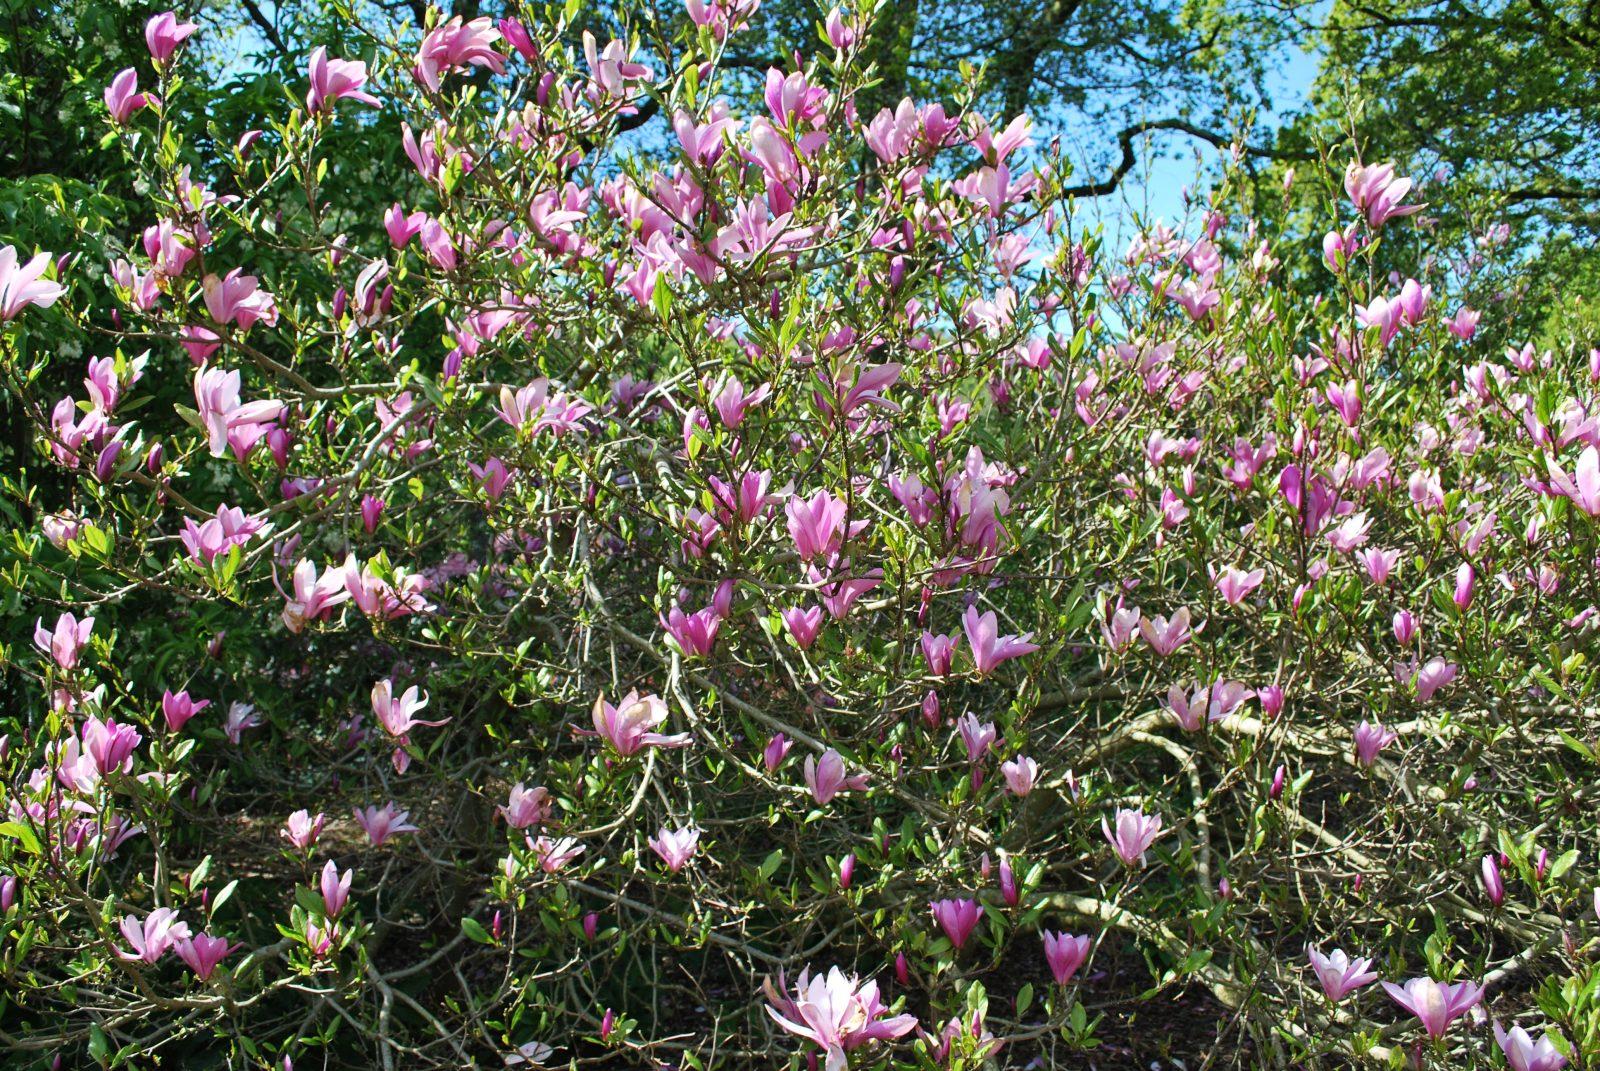 Magnolia Susan Purple Tulip Tree Shrubs For Sale Letsgoplantingcouk